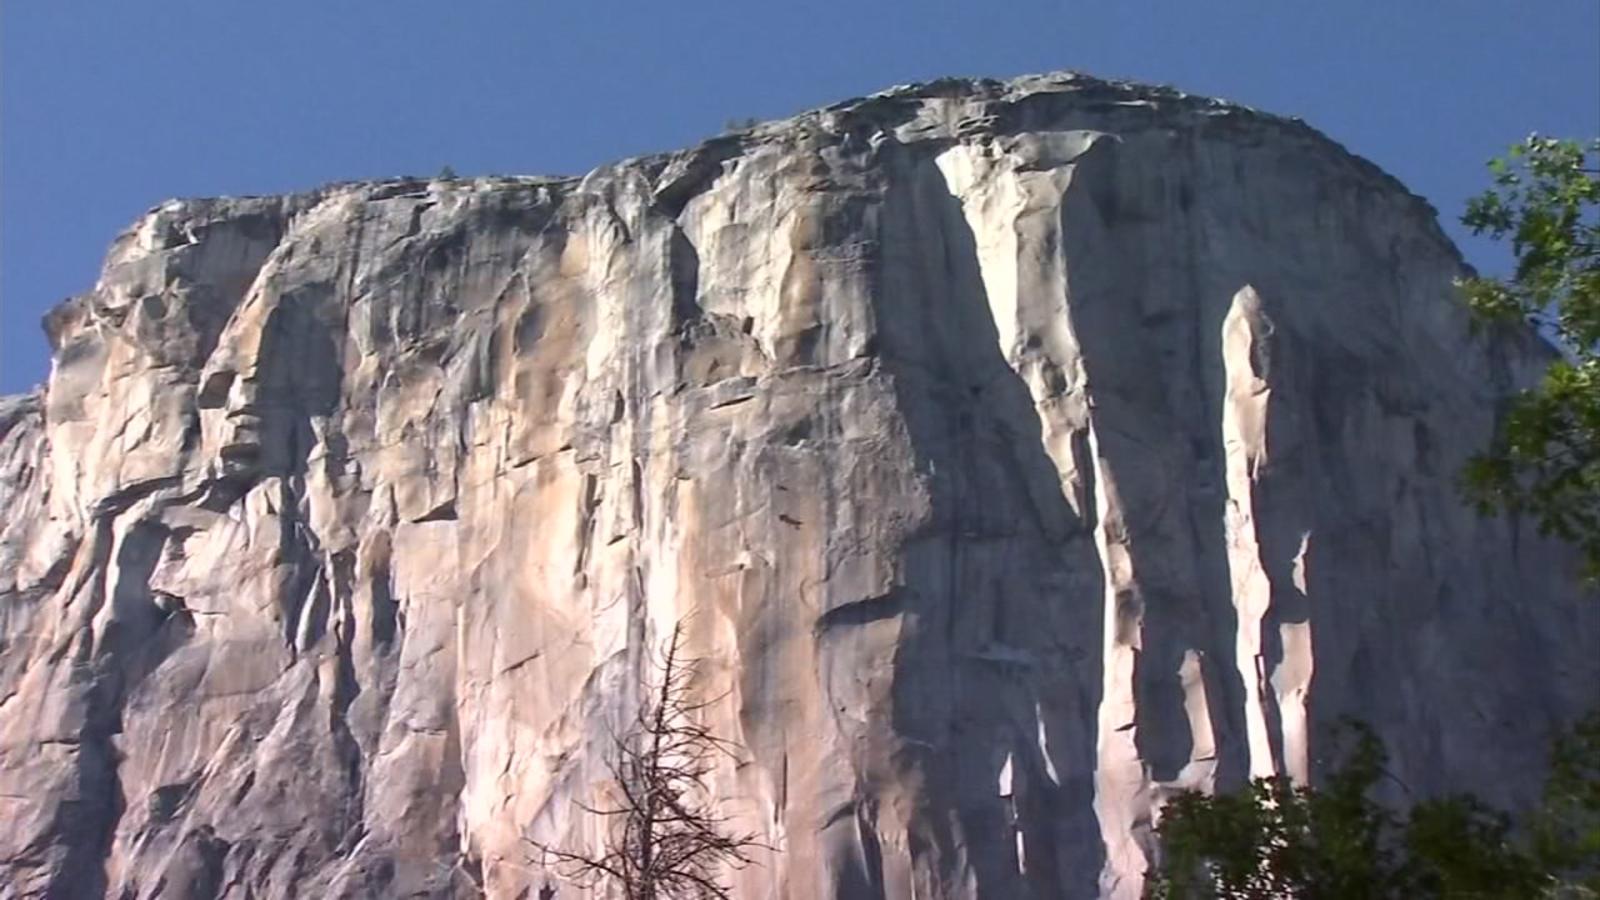 Expert climbers die climbing El Capitan in Yosemite